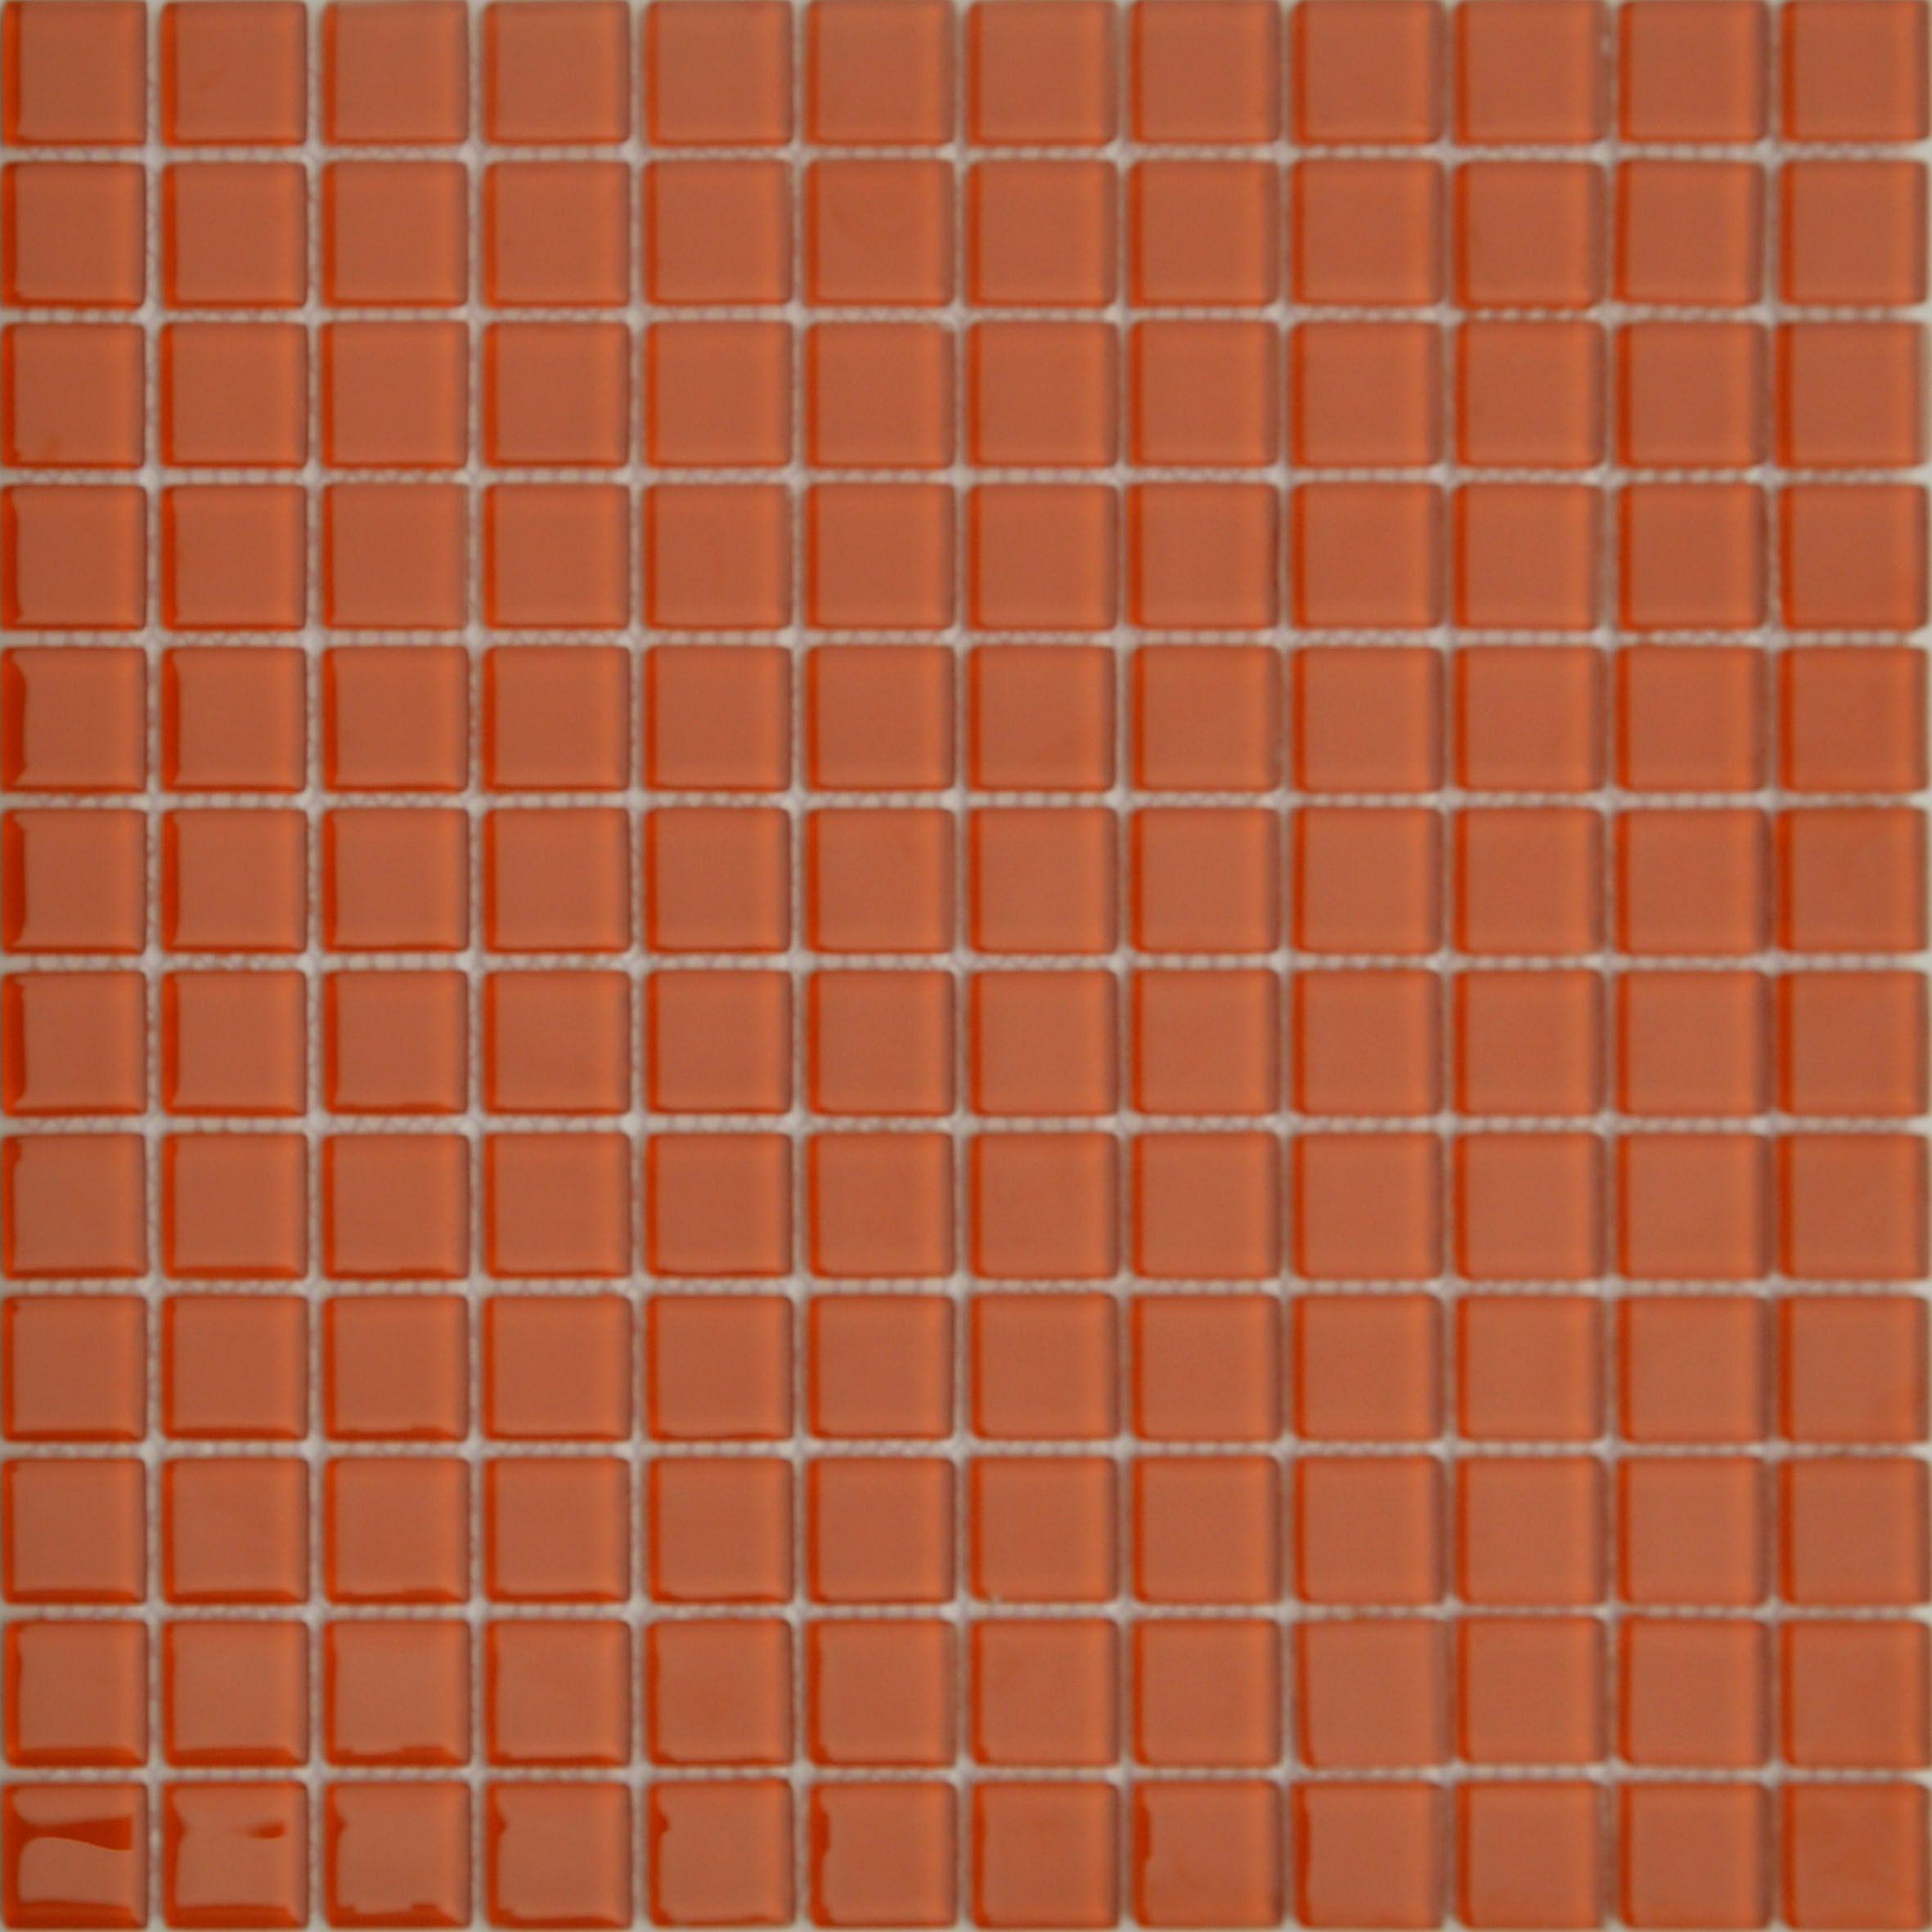 MOSAICOS DE CRISTAL: CRISTAL NARANJA 30x30 cm